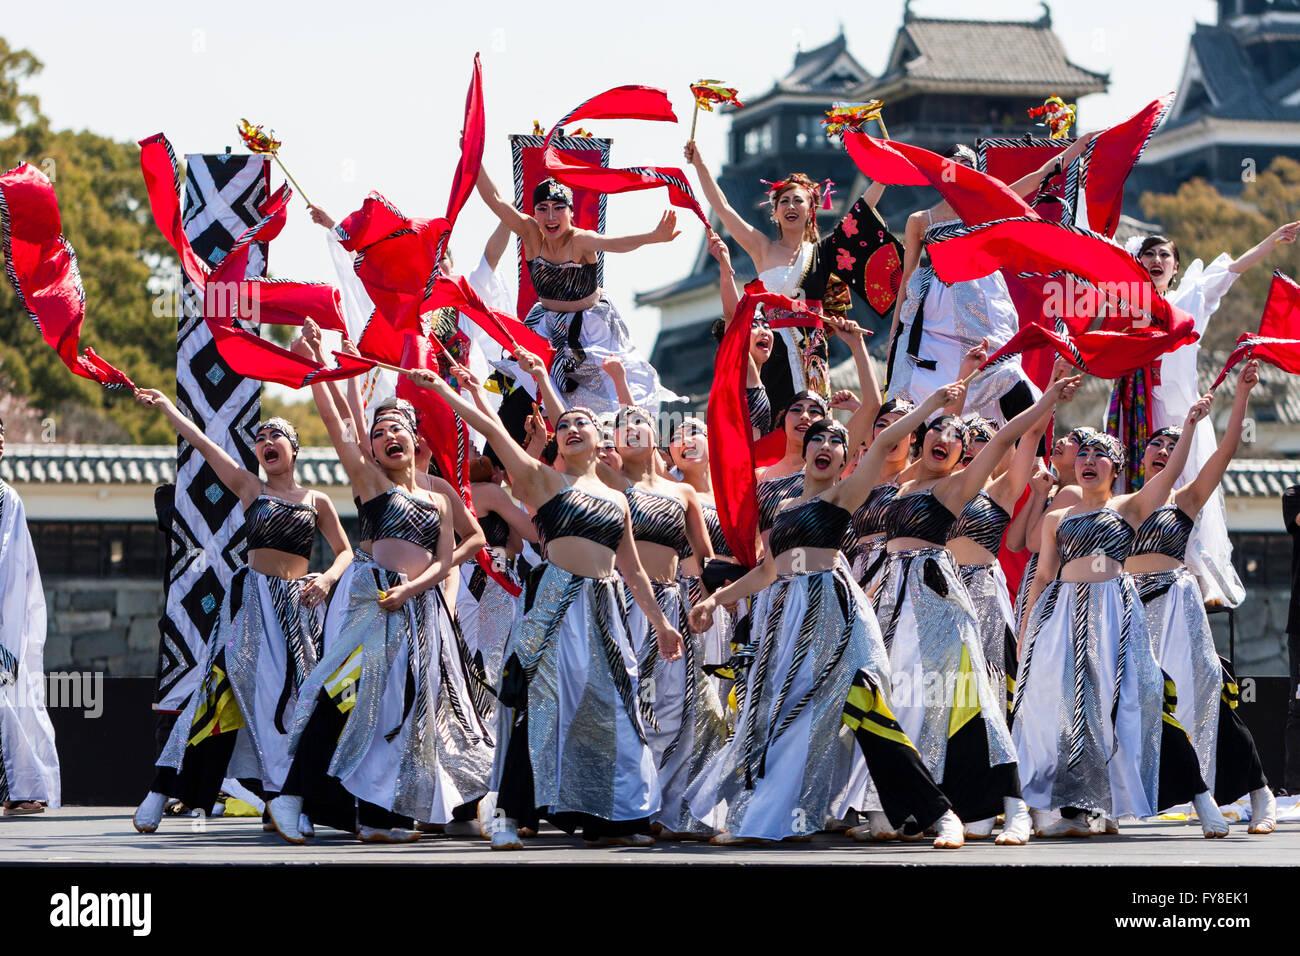 Japan, Kumamoto. Yosakoi Festival. Women team, final of historical pageant dance, all waving red streamers. Castle - Stock Image